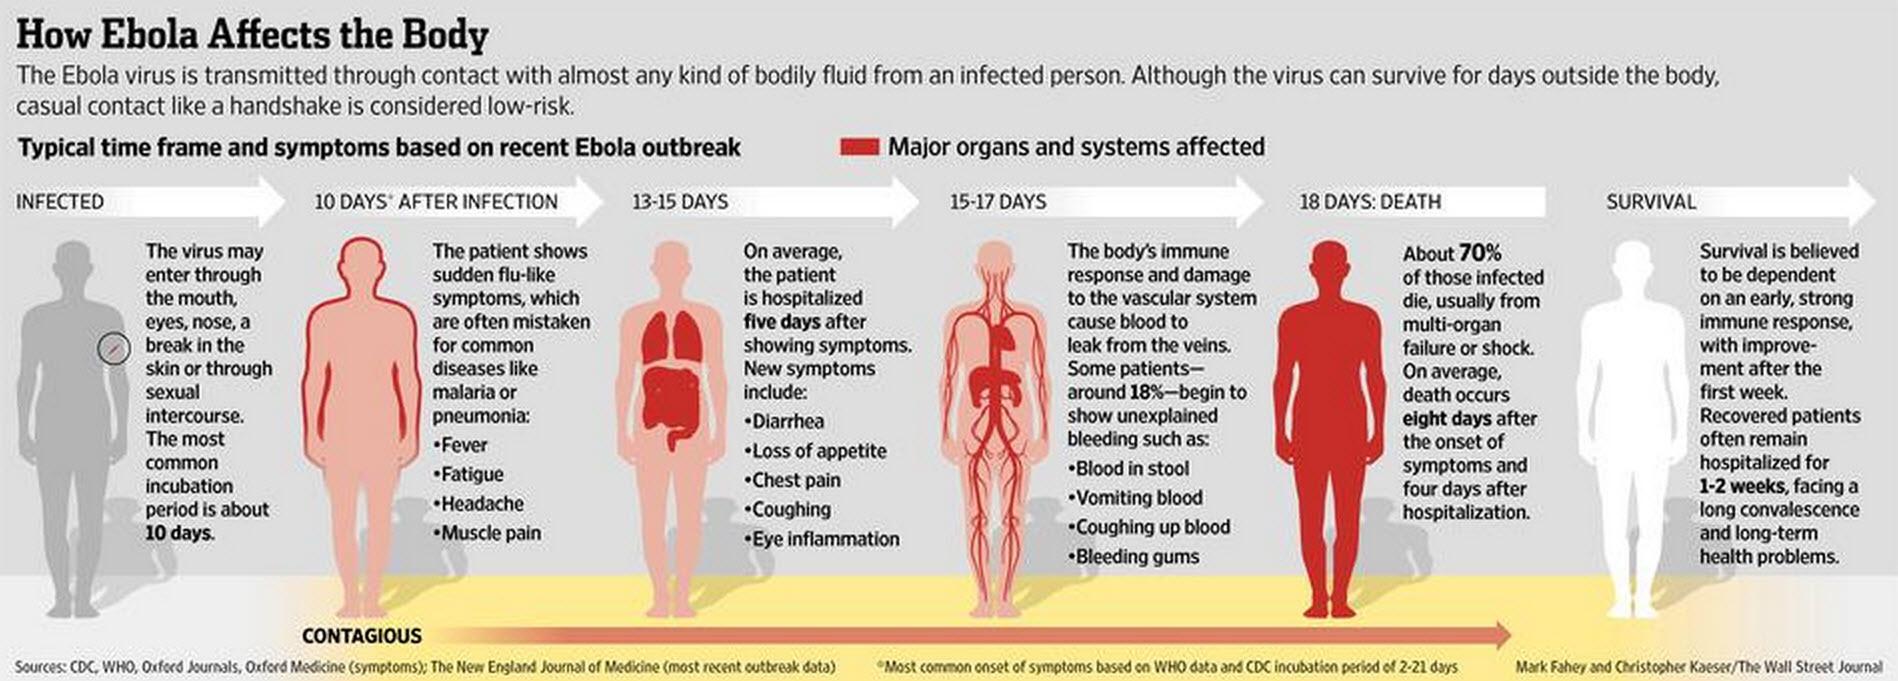 20141009_ebola2